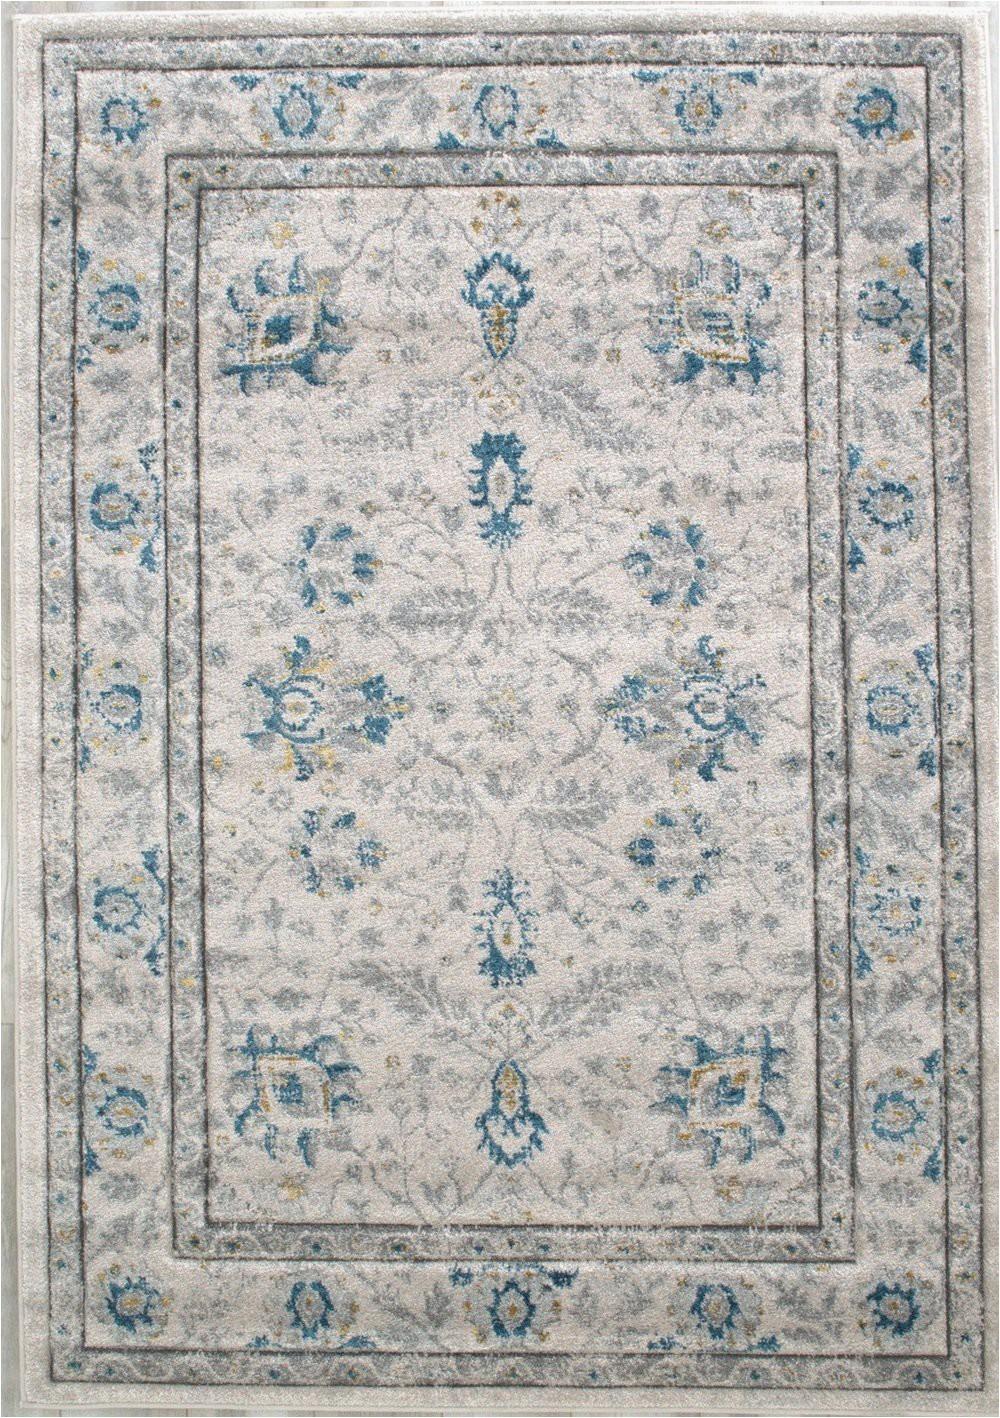 "Blue oriental Rugs 8×10 White Ivory Gray Blue oriental Rug 7 8"" X 10 2"